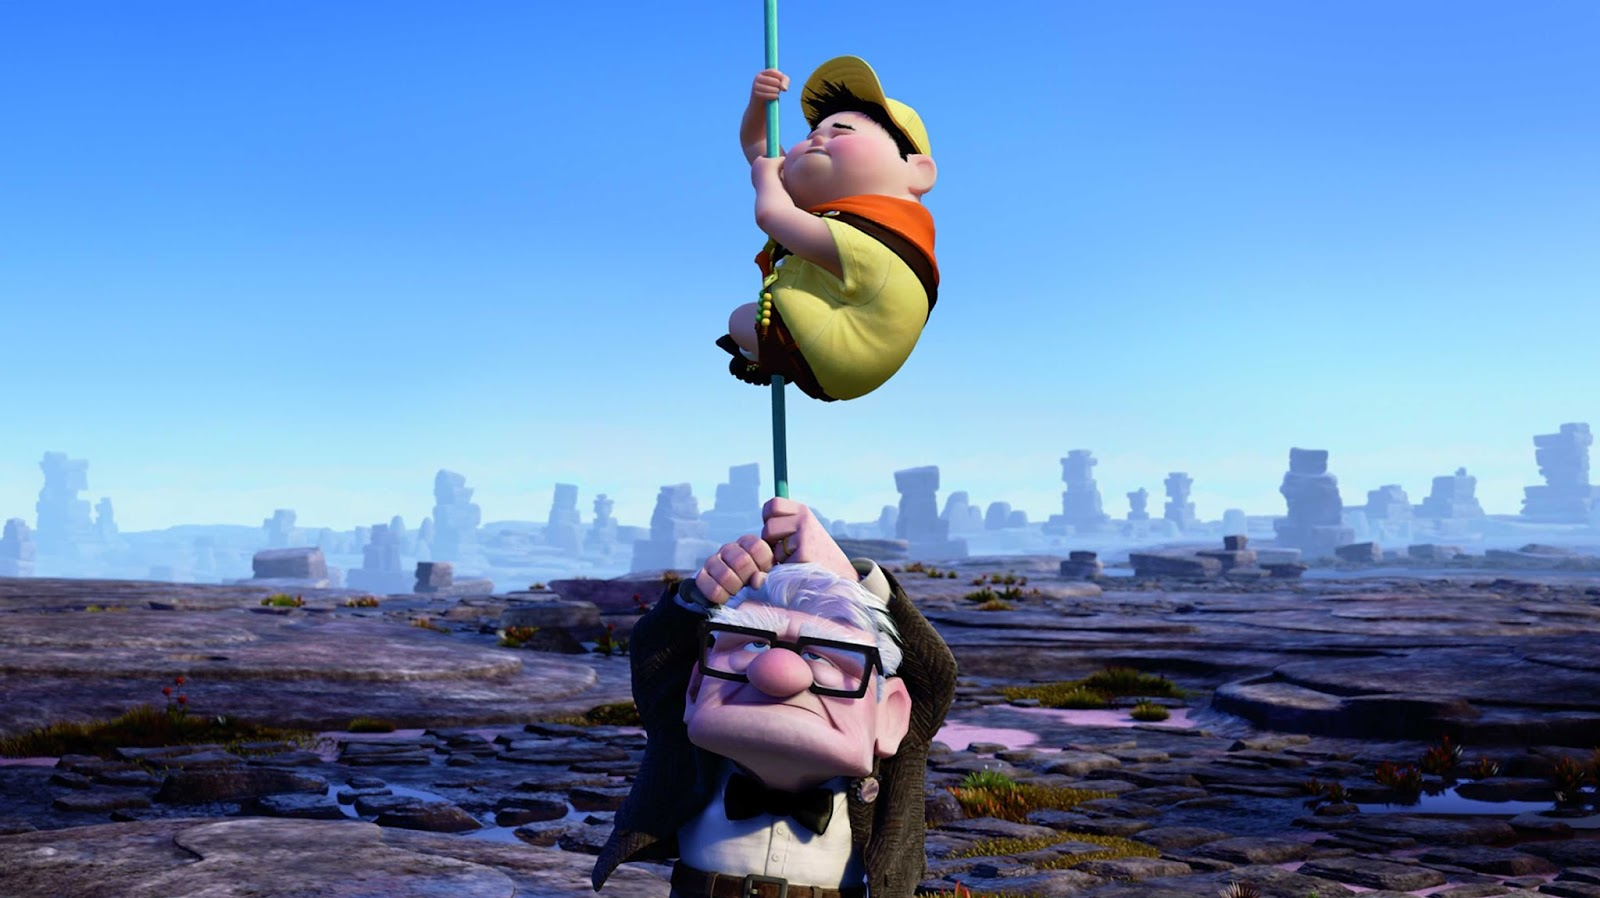 Disney HD Wallpapers: Disney Pixar UP HD Wallpapers